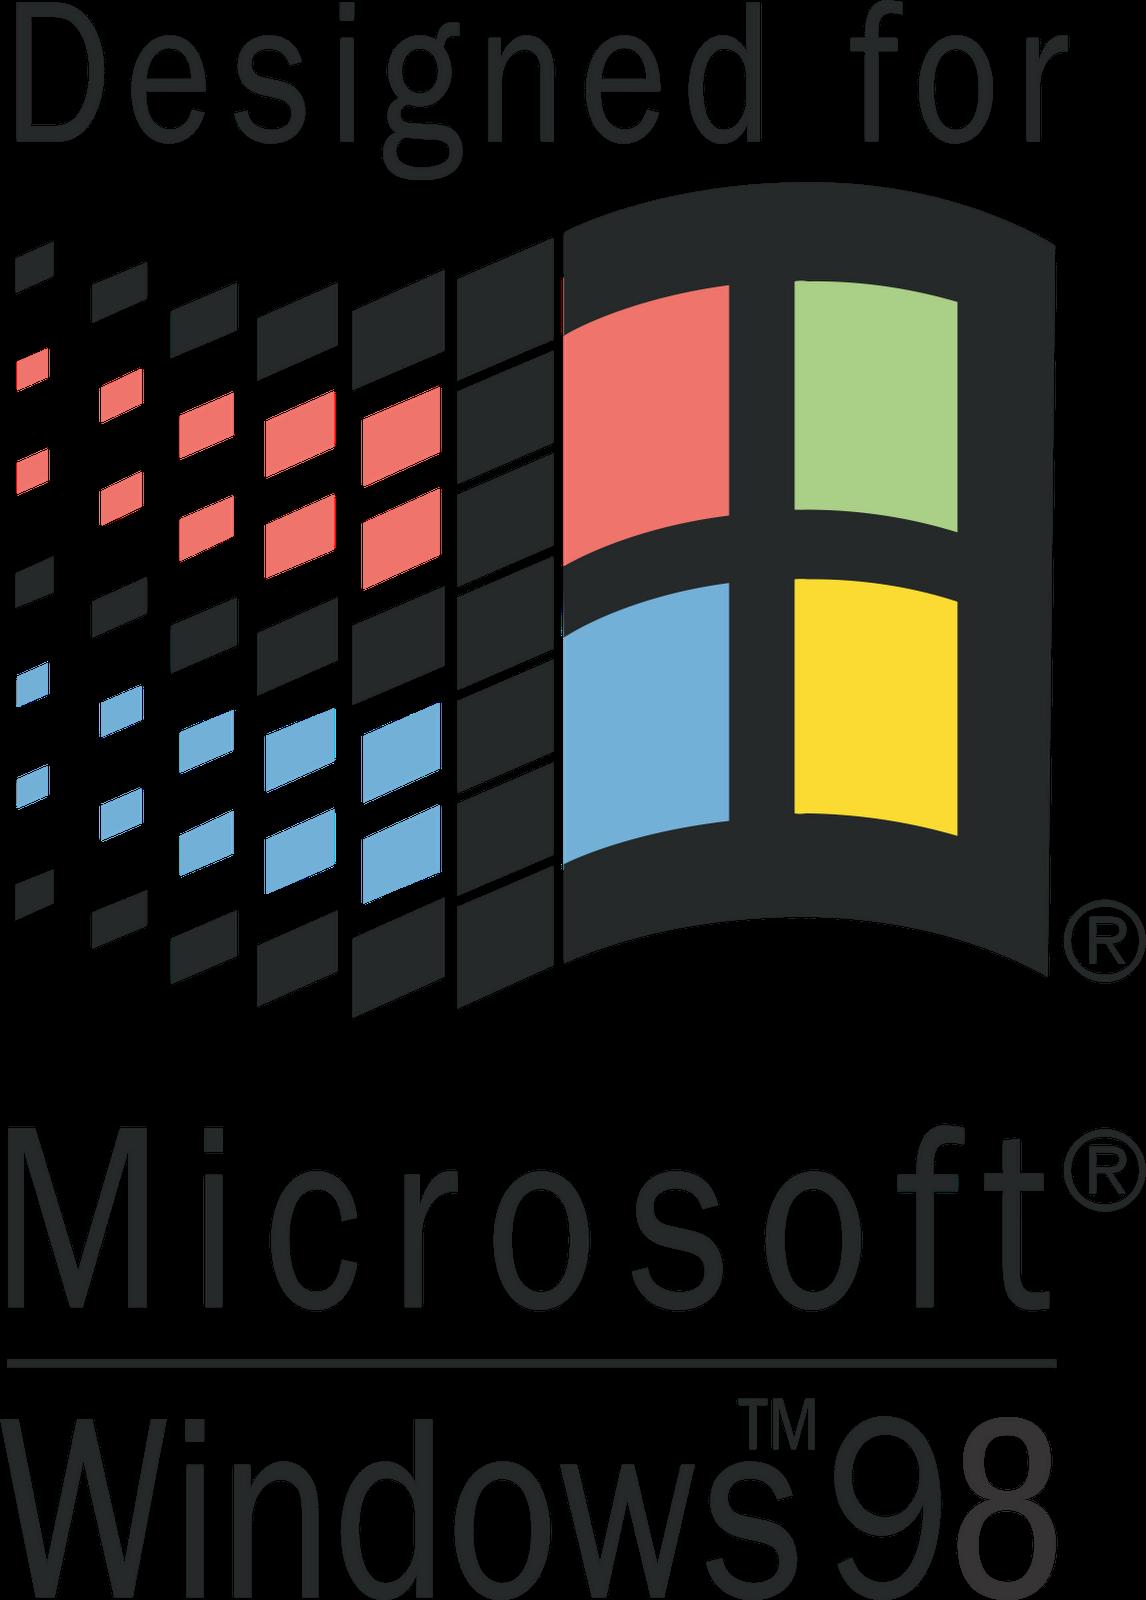 Windows 98 png. Fh logo